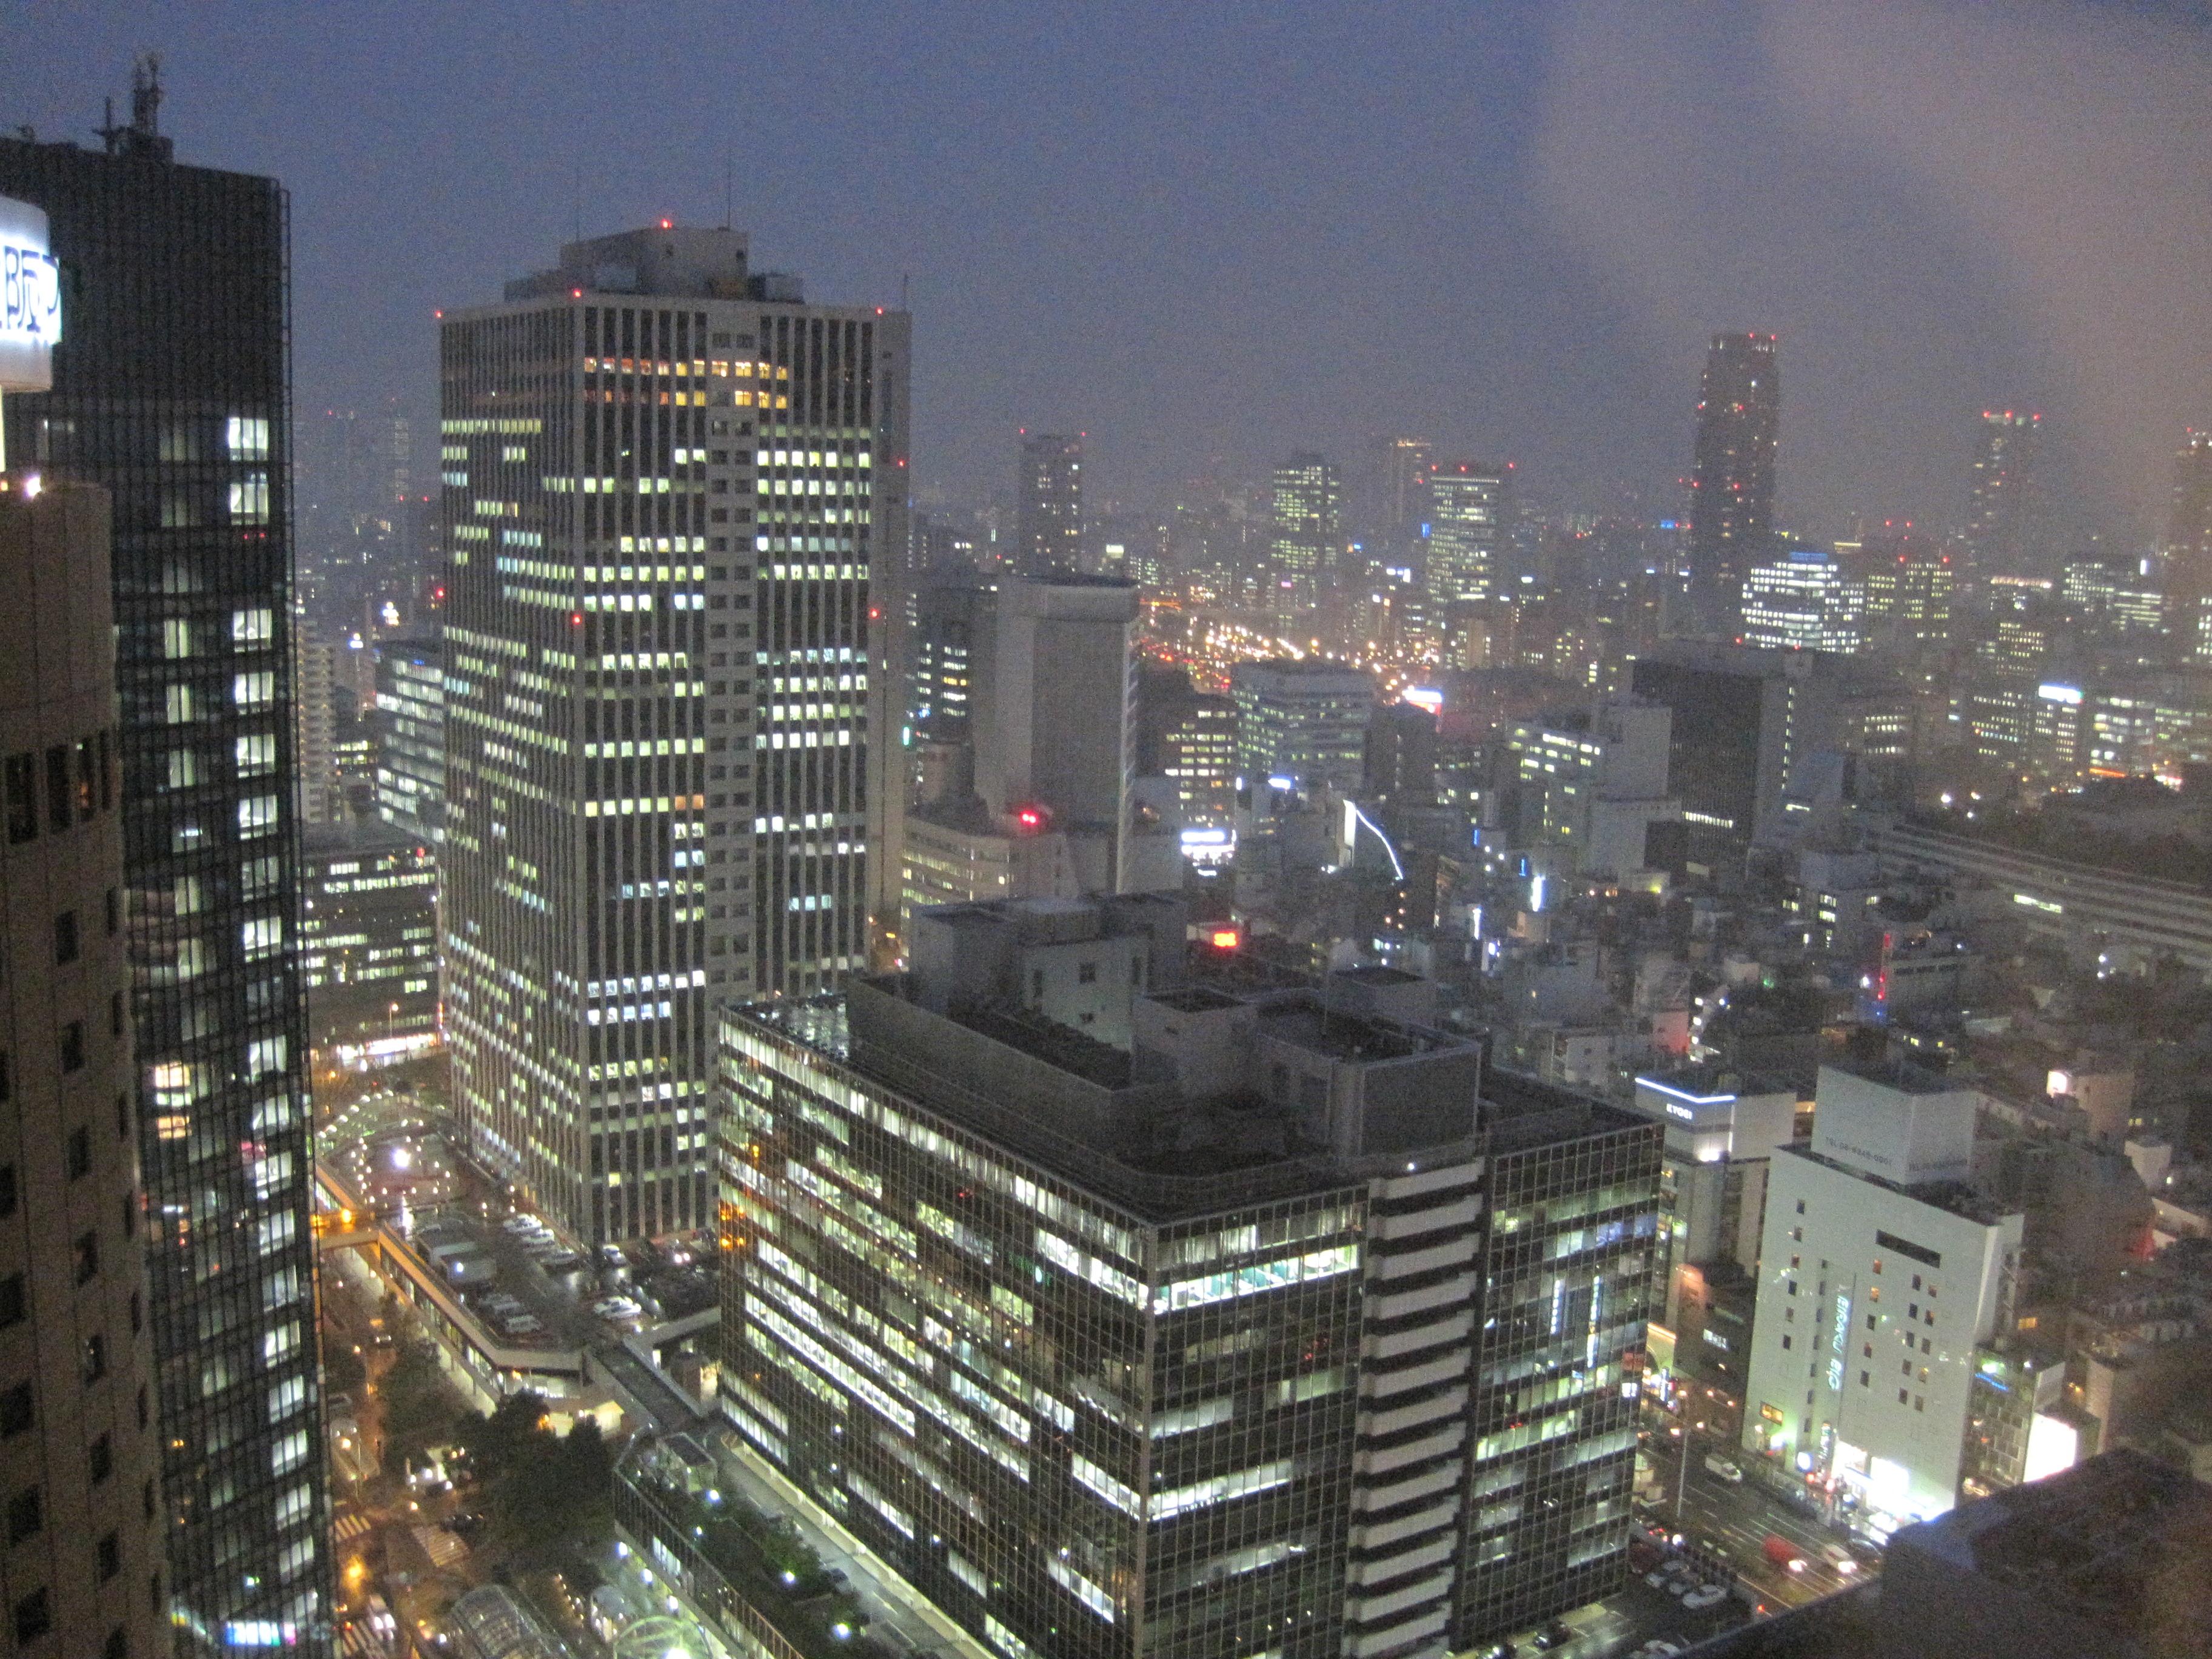 Stock: City by Night by AntiRetrovirus